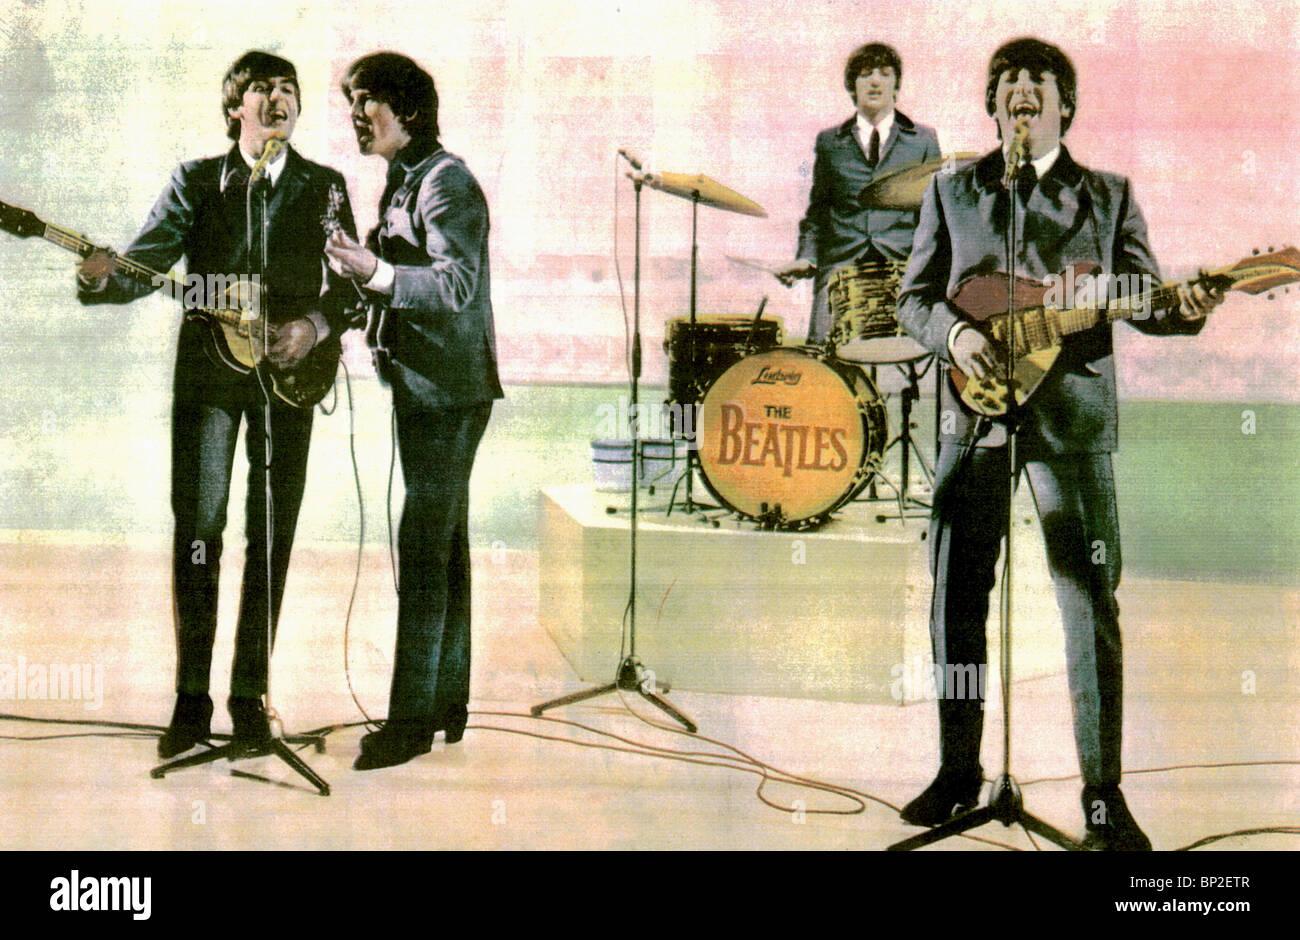 PAUL MCCARTNEY GEORGE HARRISON Ringo Starr et JOHN LENNON POUR LES BEATLES (1964) Photo Stock